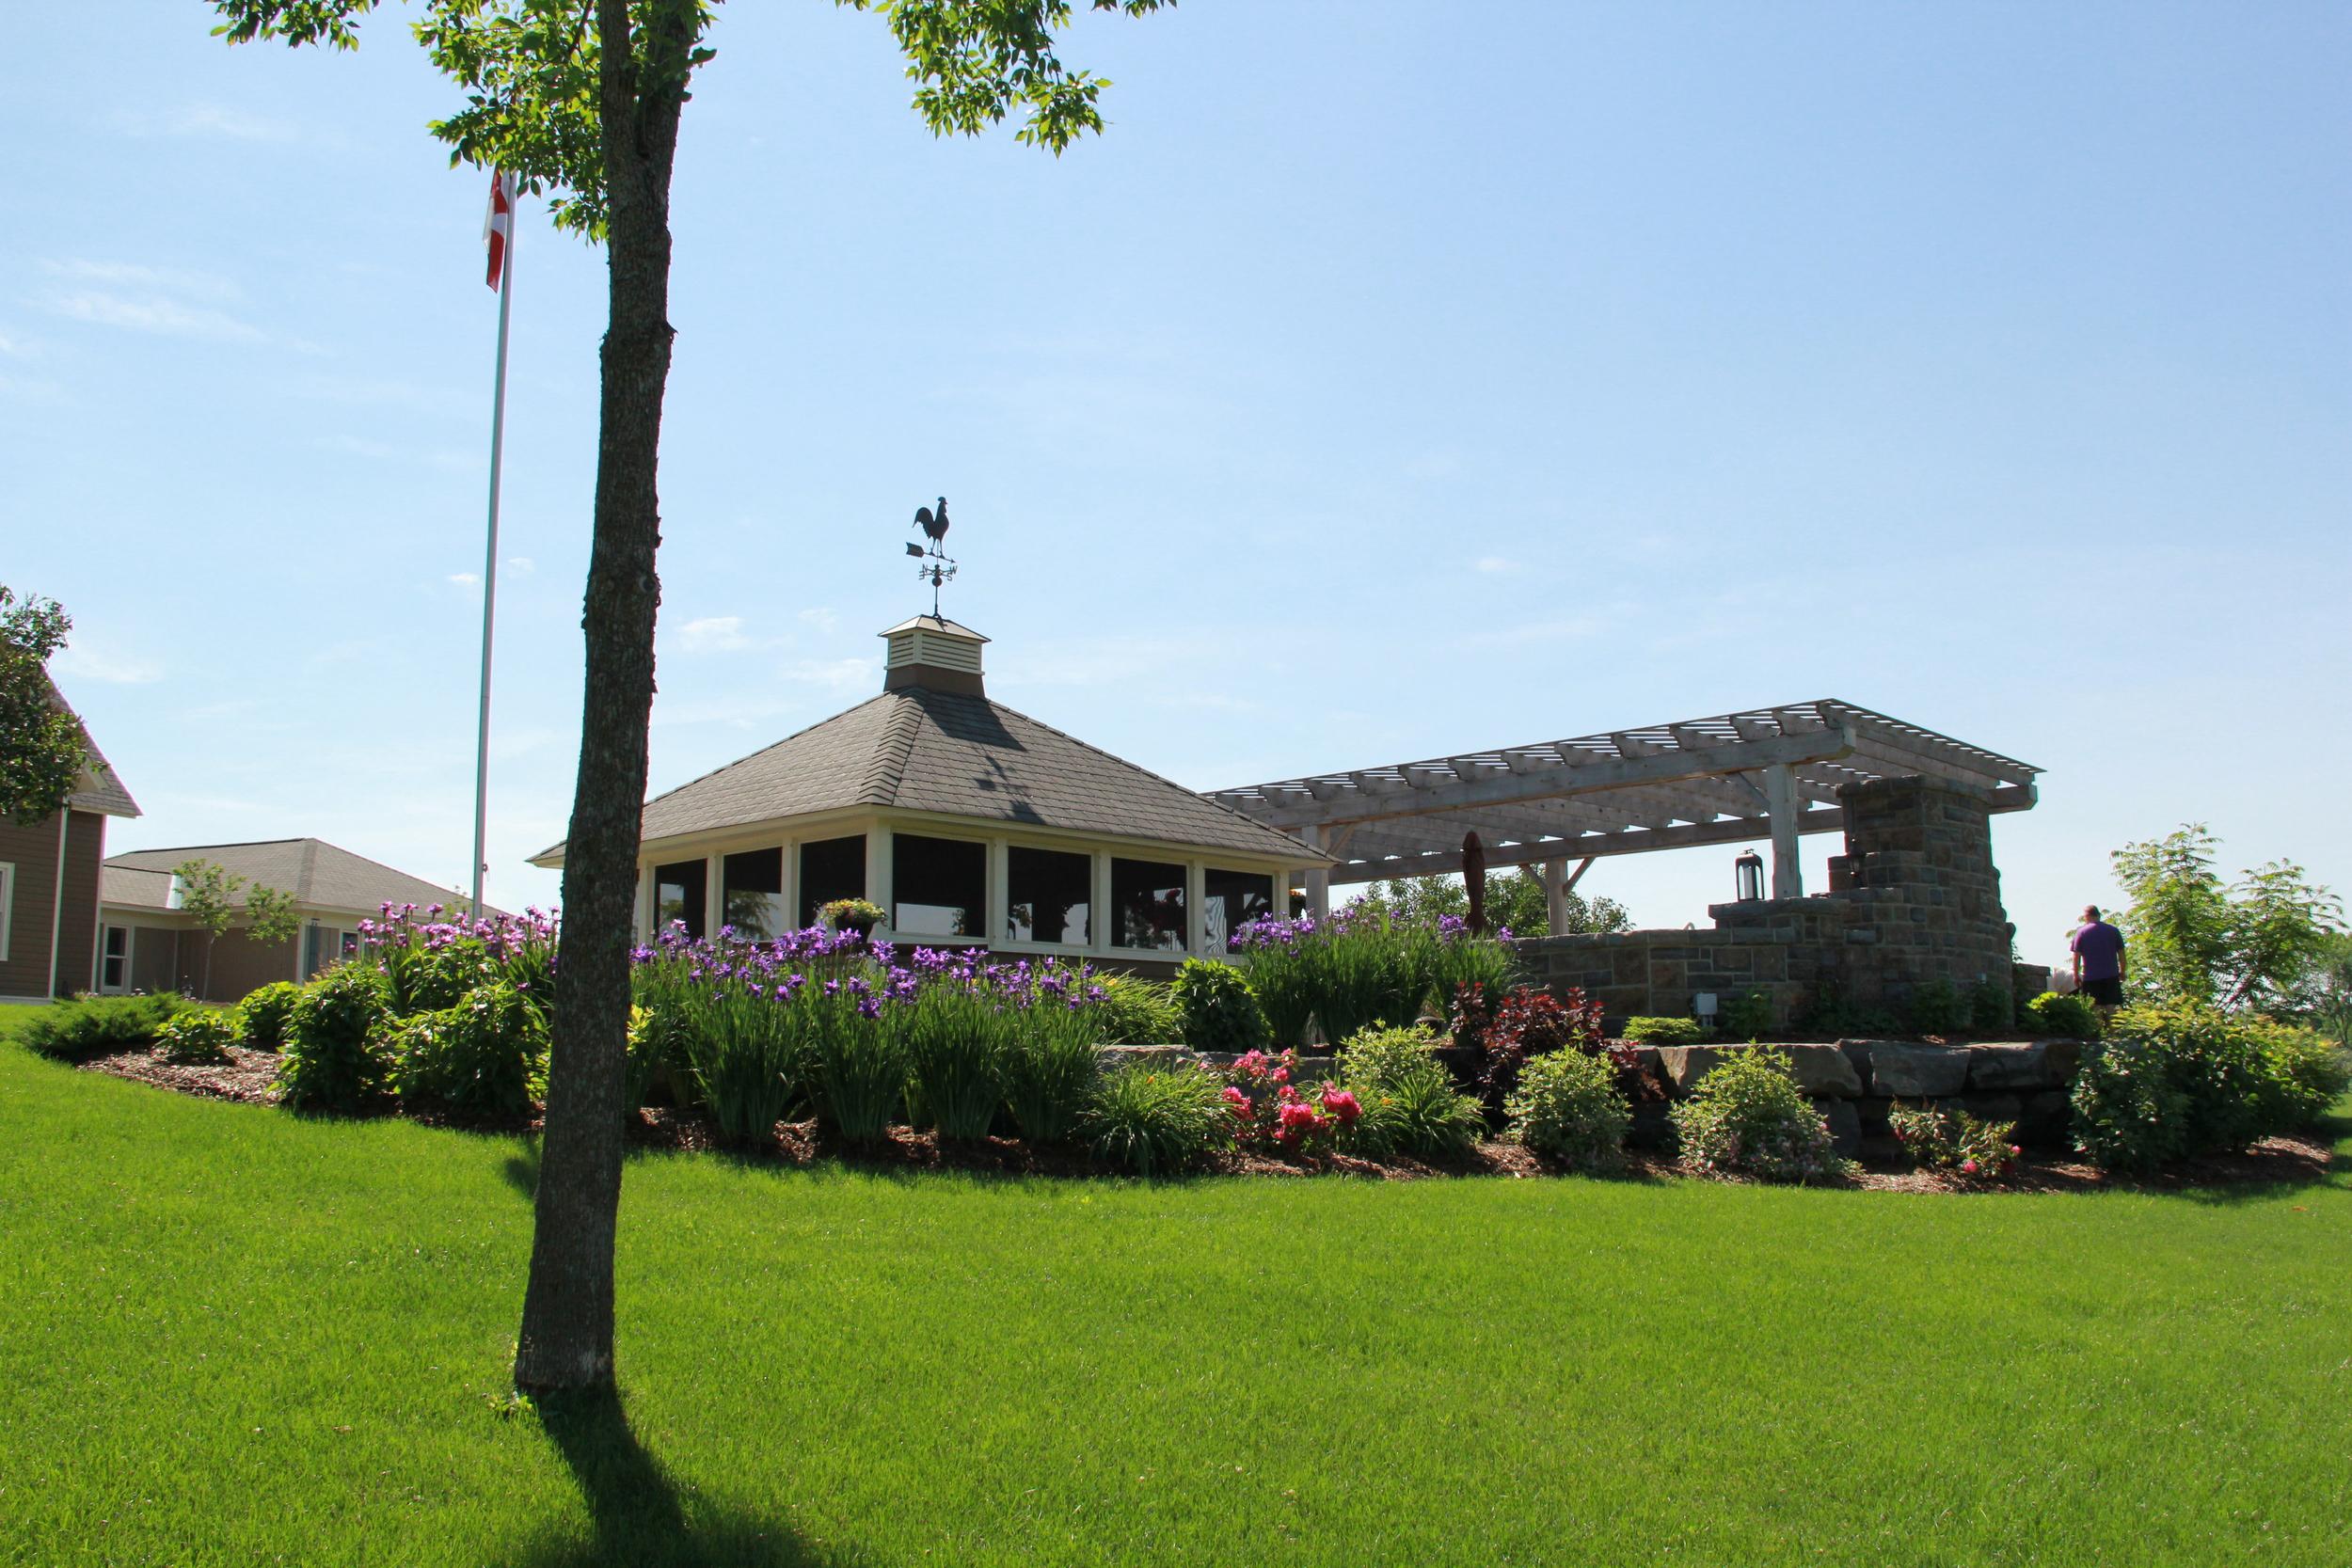 Country Home | Gazebo | Arbour | Garden | Landscape Design | Landscaping | Riverview Design Solutions | Prescott, Ontario, Canada